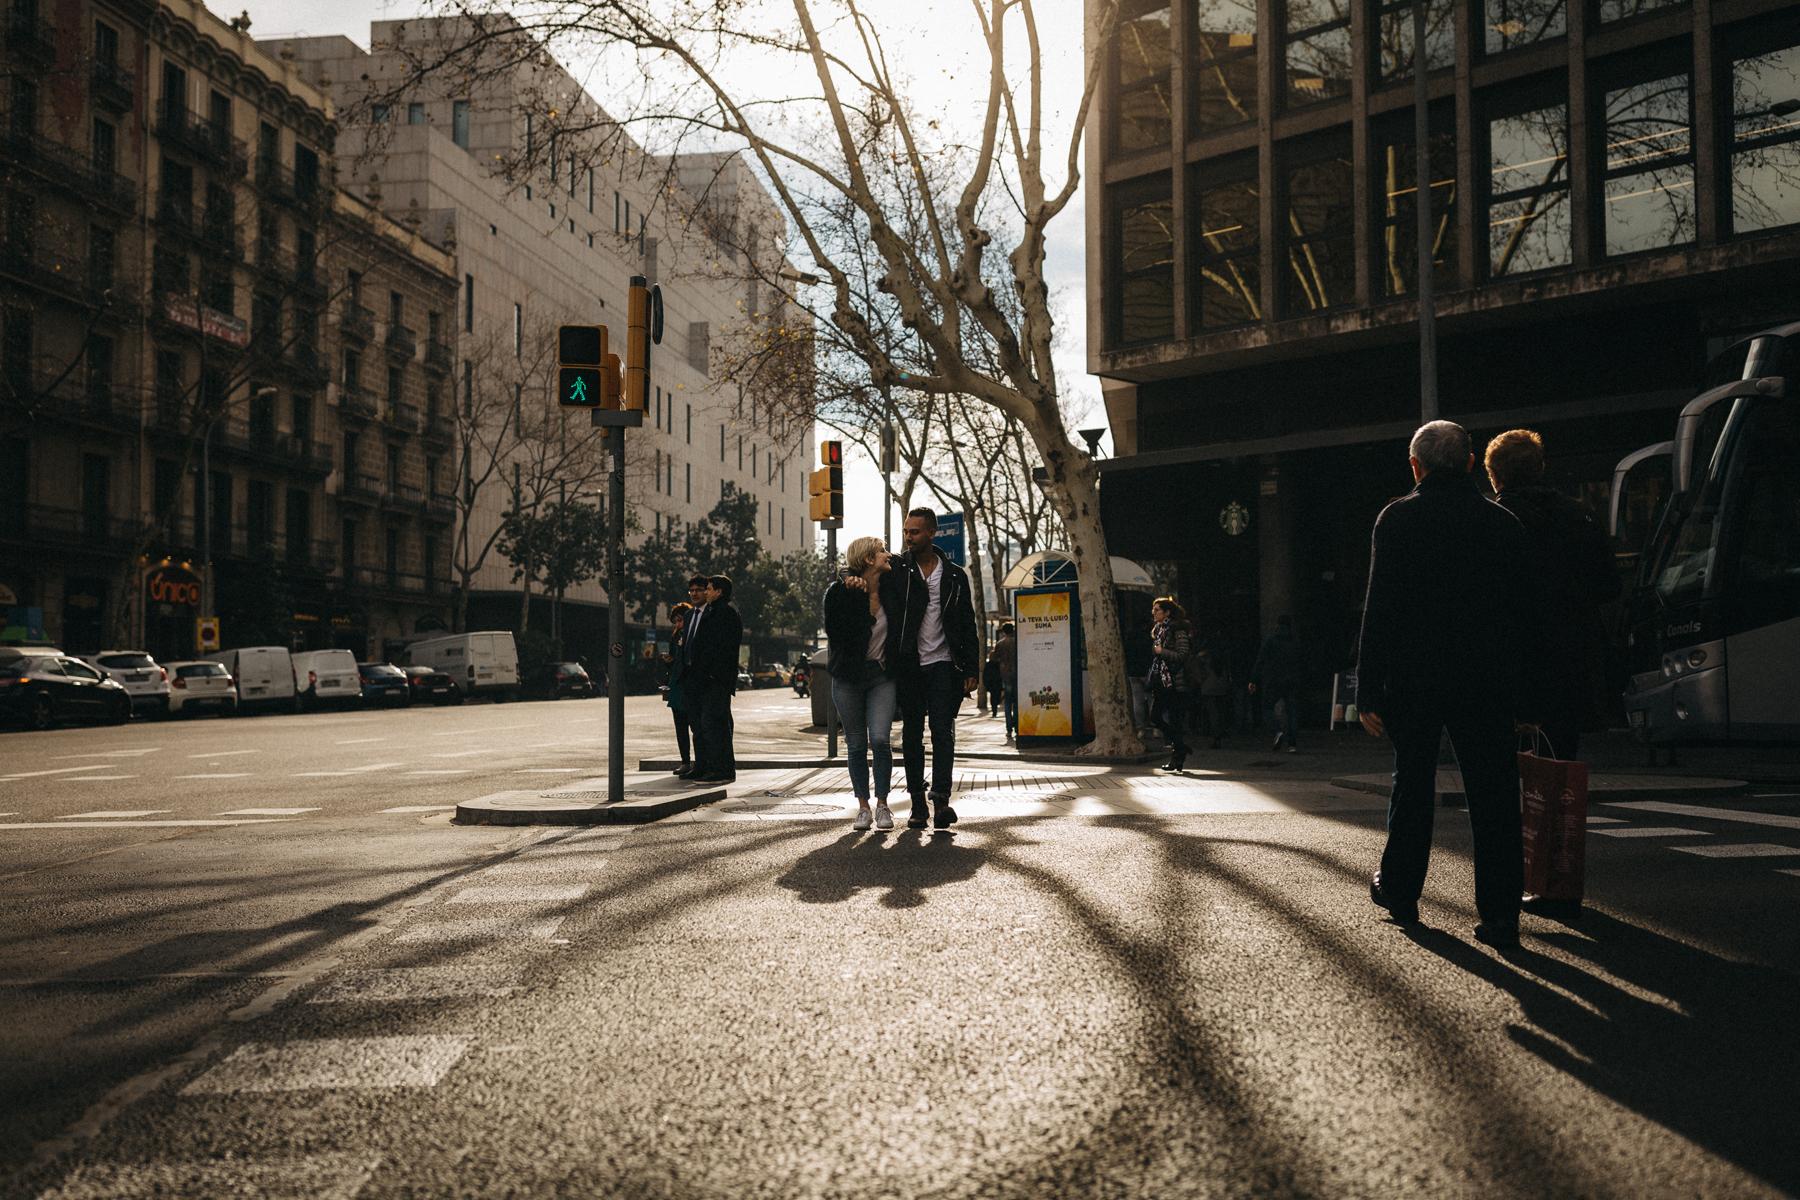 raissa simon fotografie urban coupleshooting barcelona 016 - Wietske + Stefanos